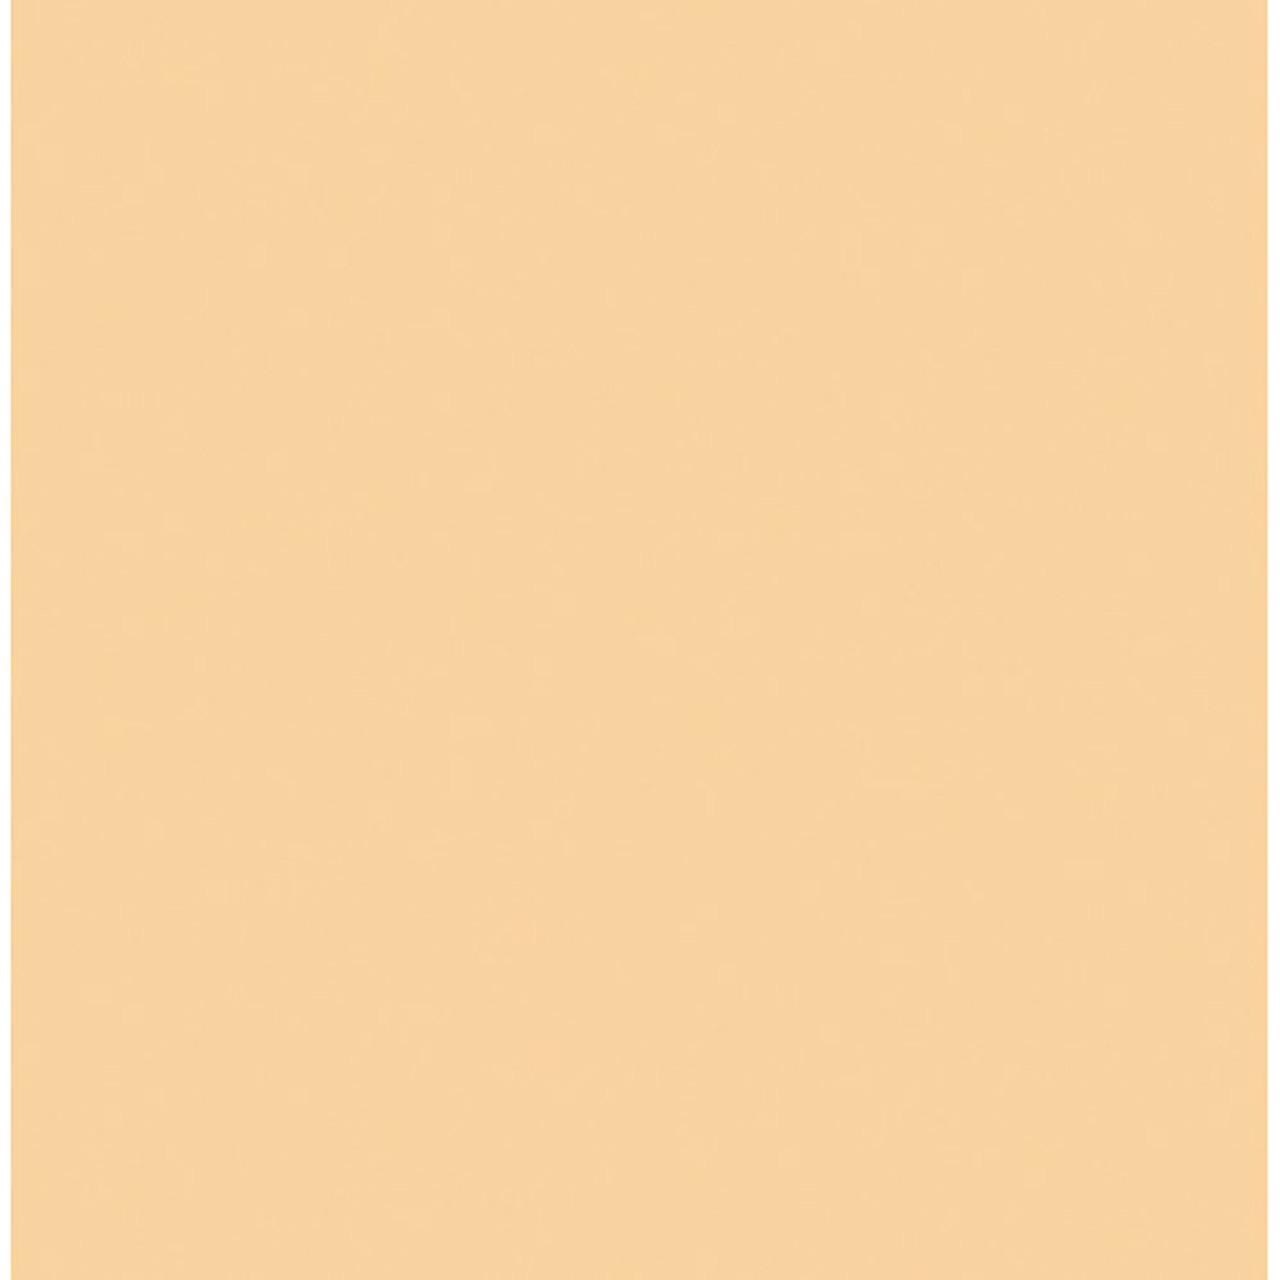 "#3442 Rosco Gels Roscolux Half Straw (1/2 CTS), 20x24"""